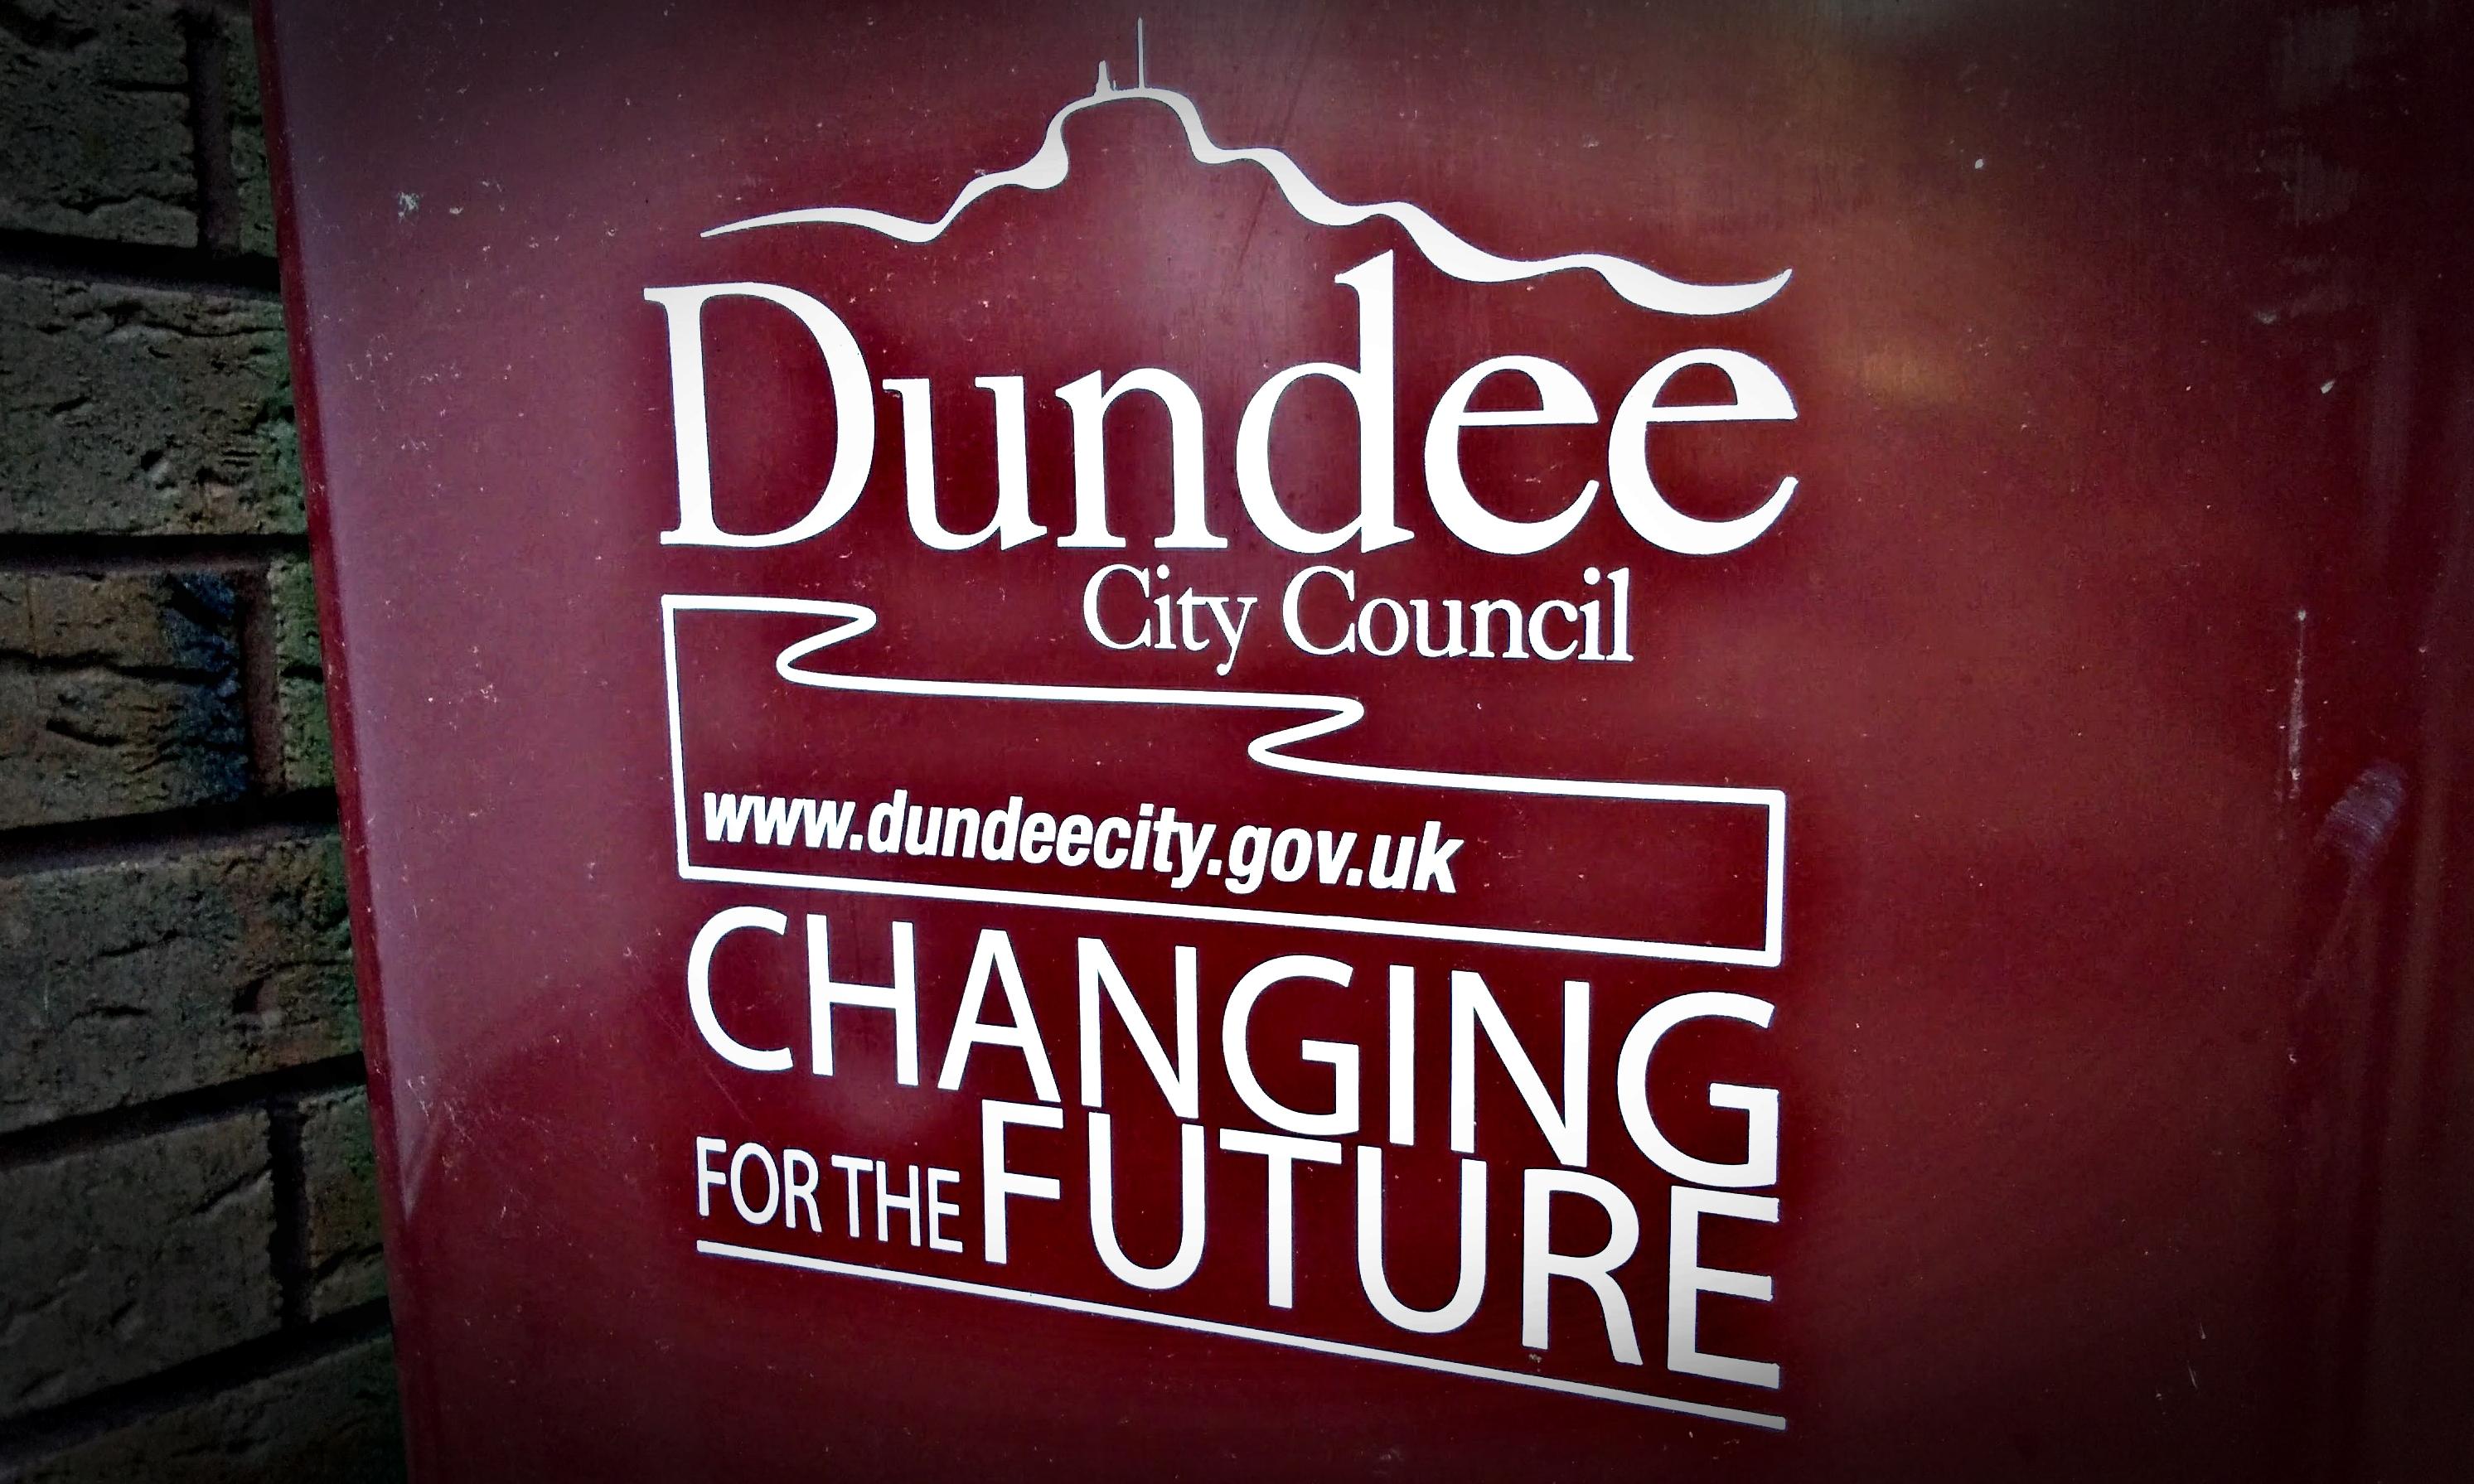 Dundee City Council.